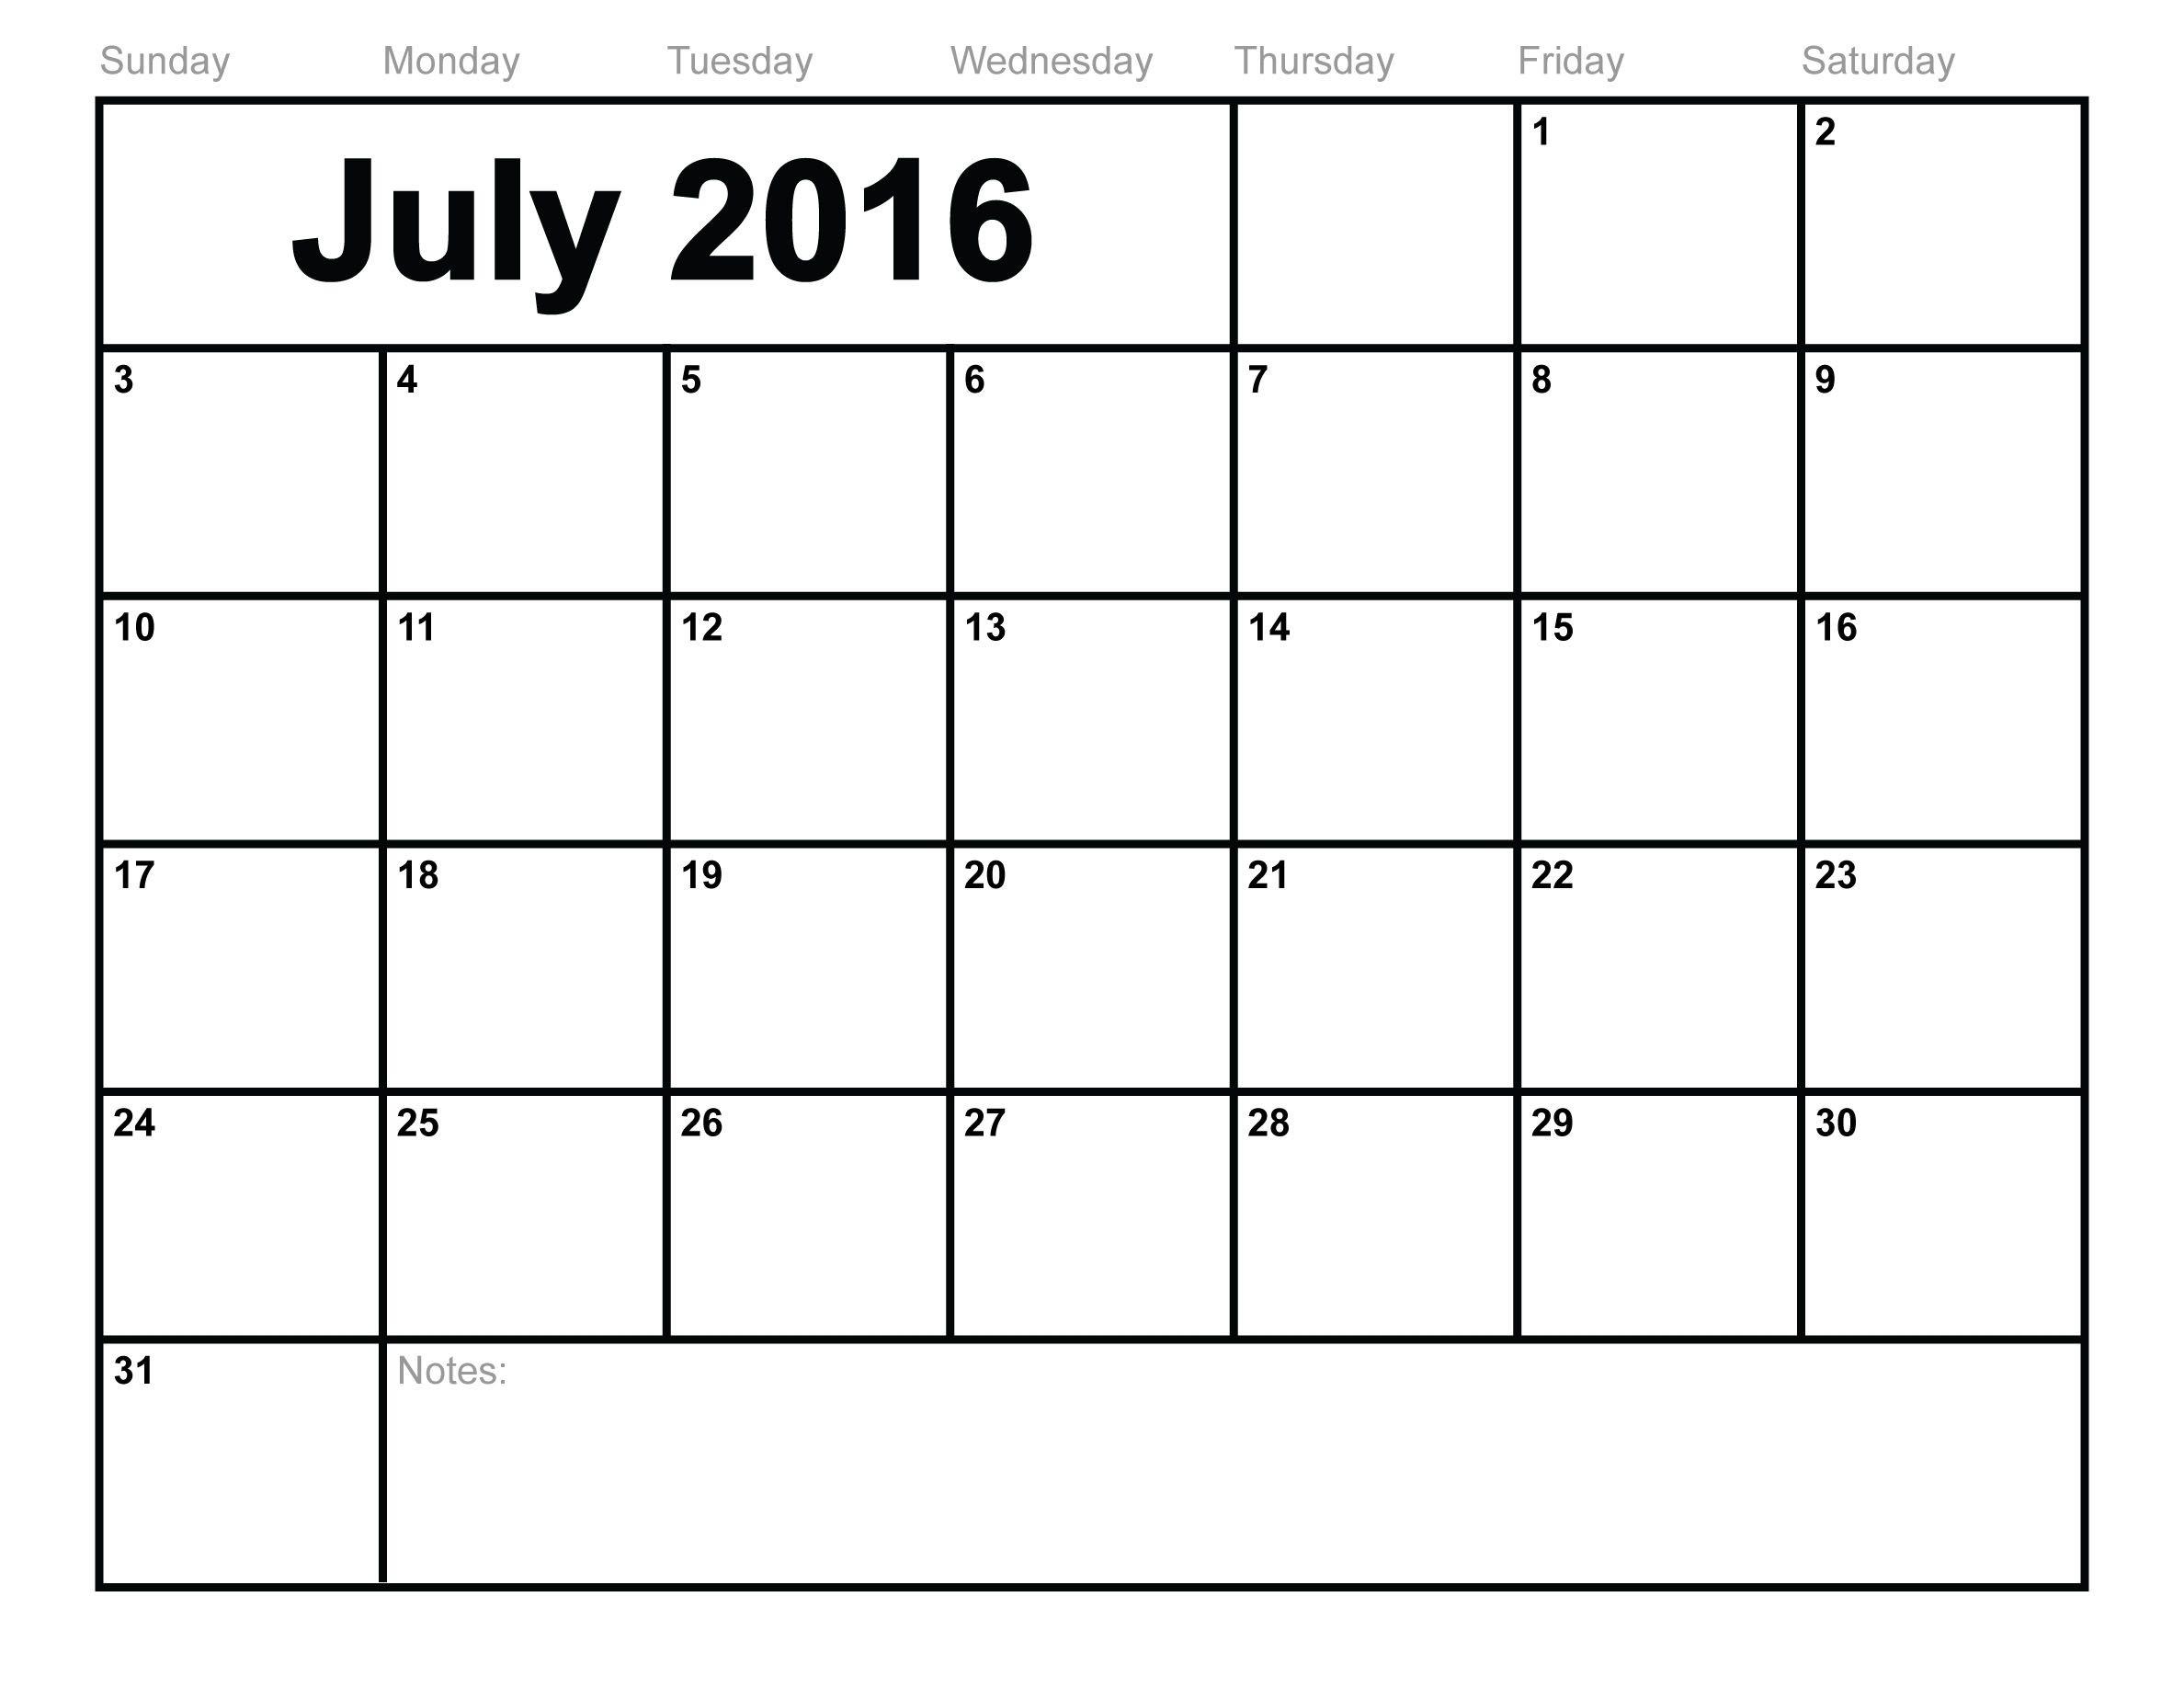 Free July 2016 Printable Calendar Calender Pinterest3abry